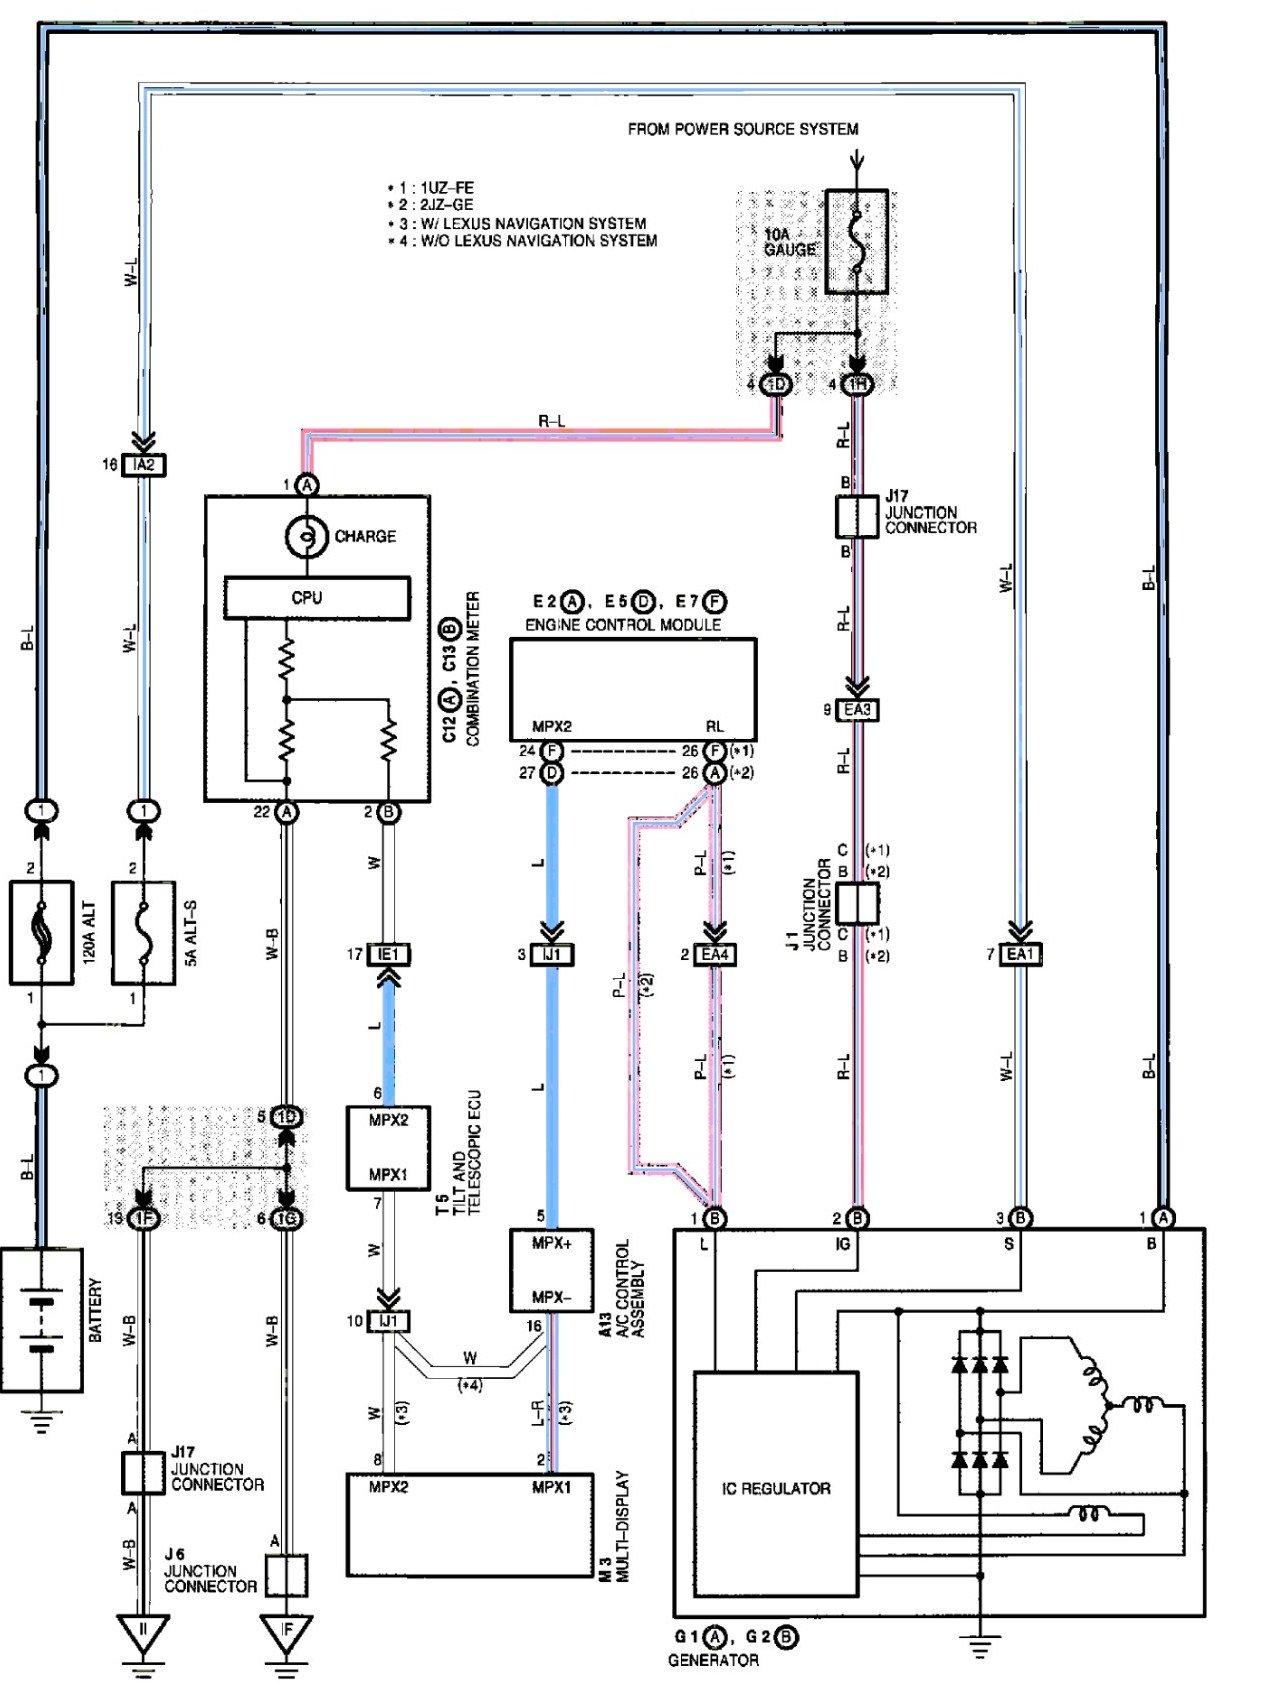 [TBQL_4184]  OA_0231] 2000 Lexus Gs300 Electrical Diagram Download Diagram | Lexus Gs300 Ac Wiring Diagram |  | Momece Genion Greas Bocep Semec Mohammedshrine Librar Wiring 101